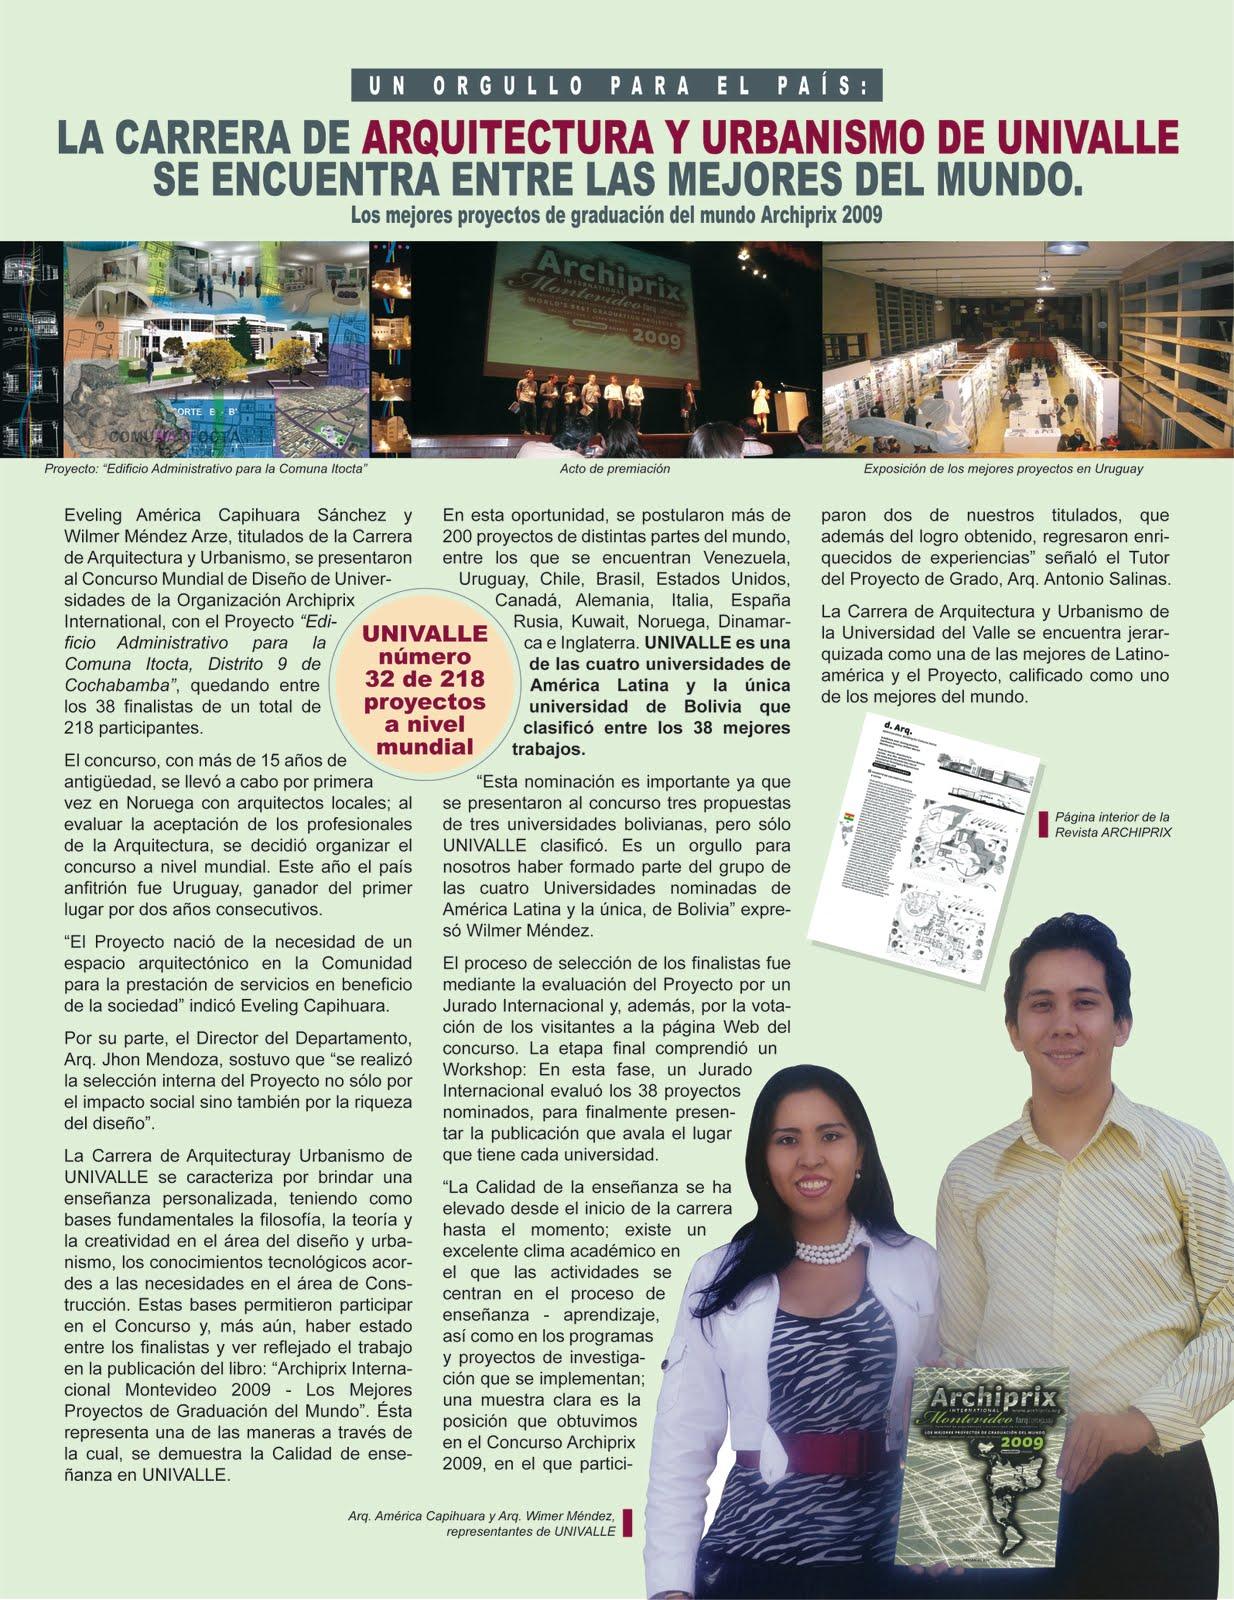 Arquitectura univalle la carrera de arquitectura y for Materias de la carrera arquitectura